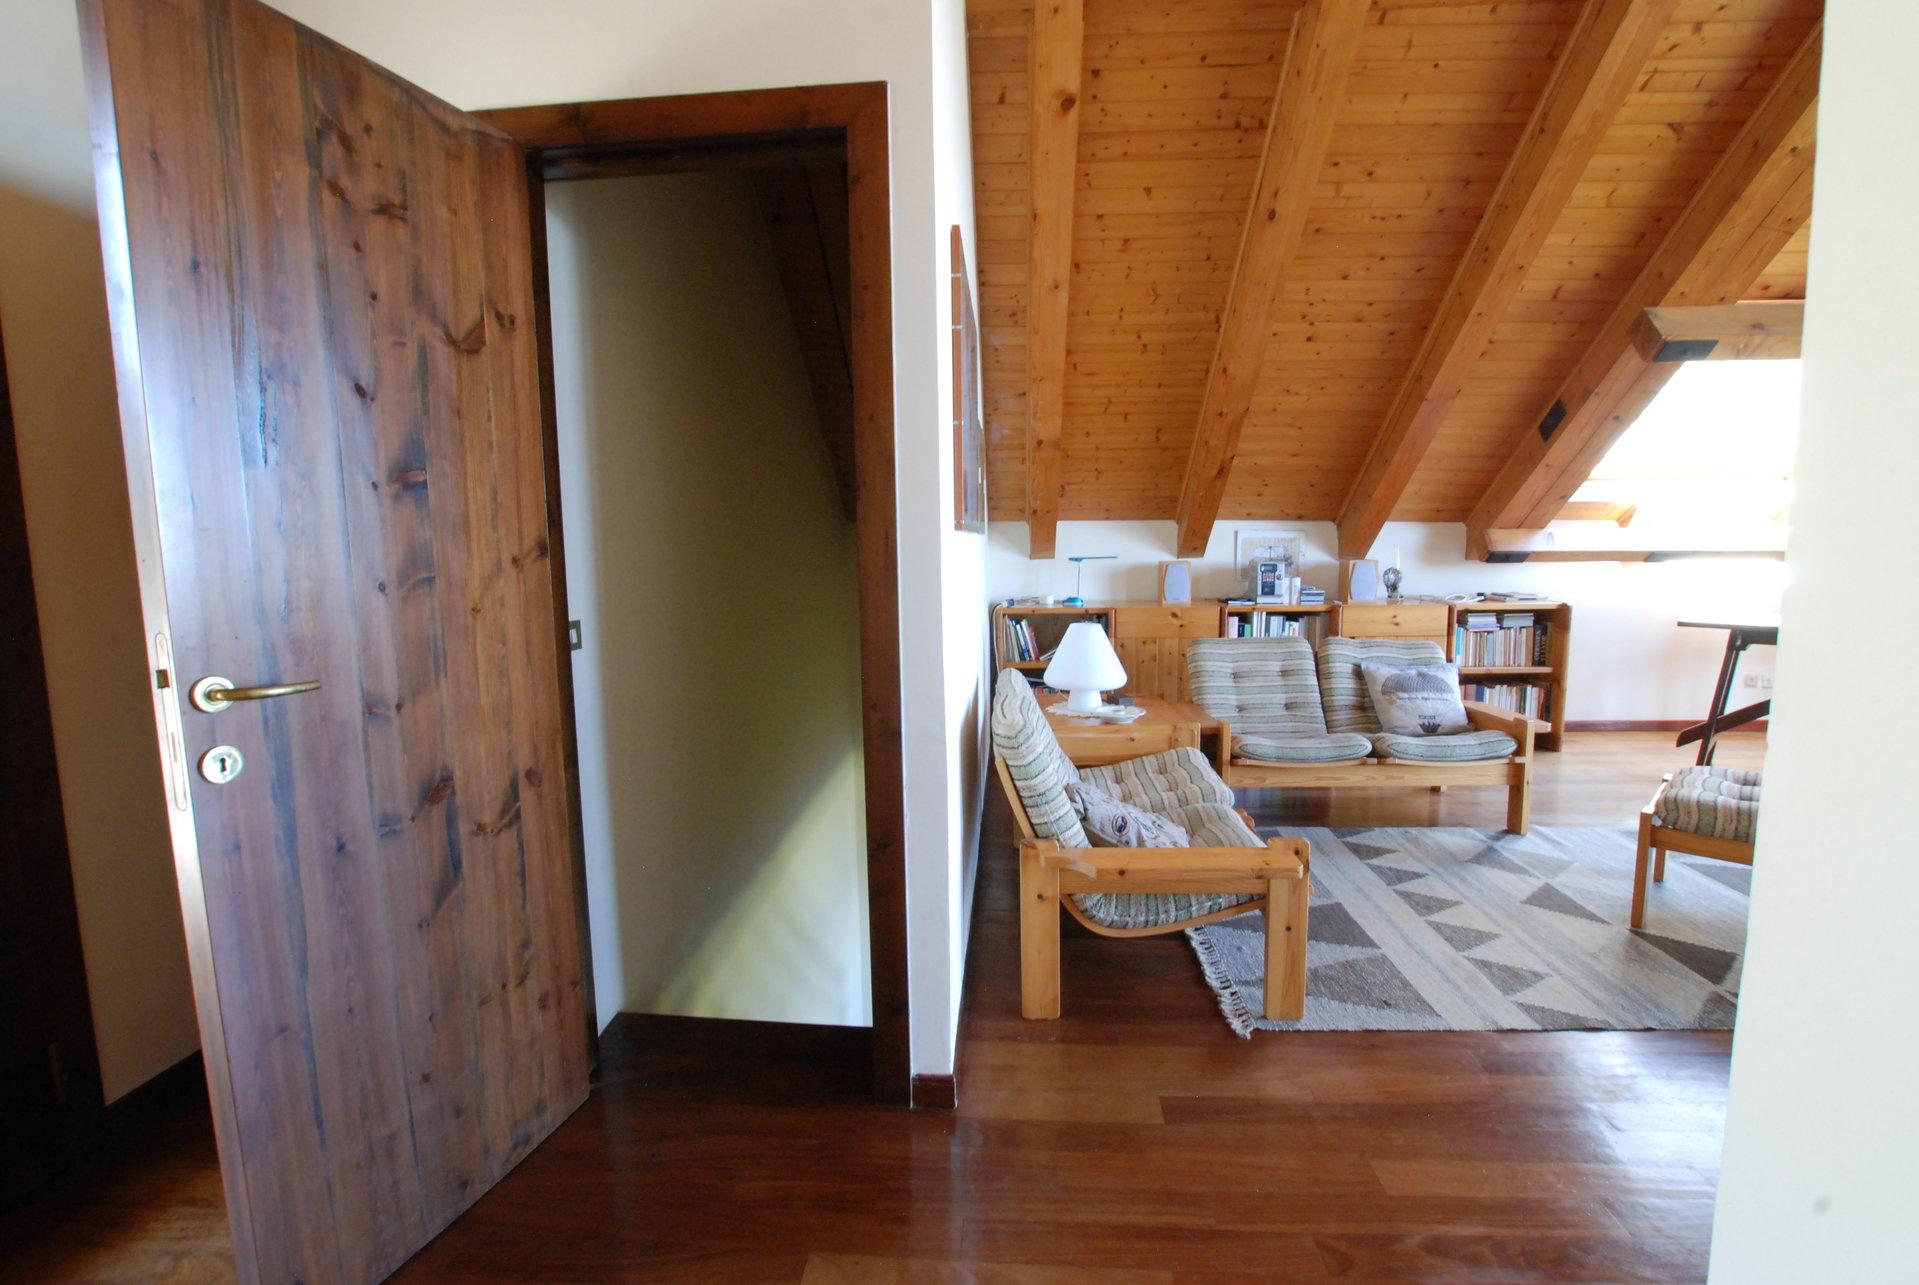 Villa for sale in Gignese